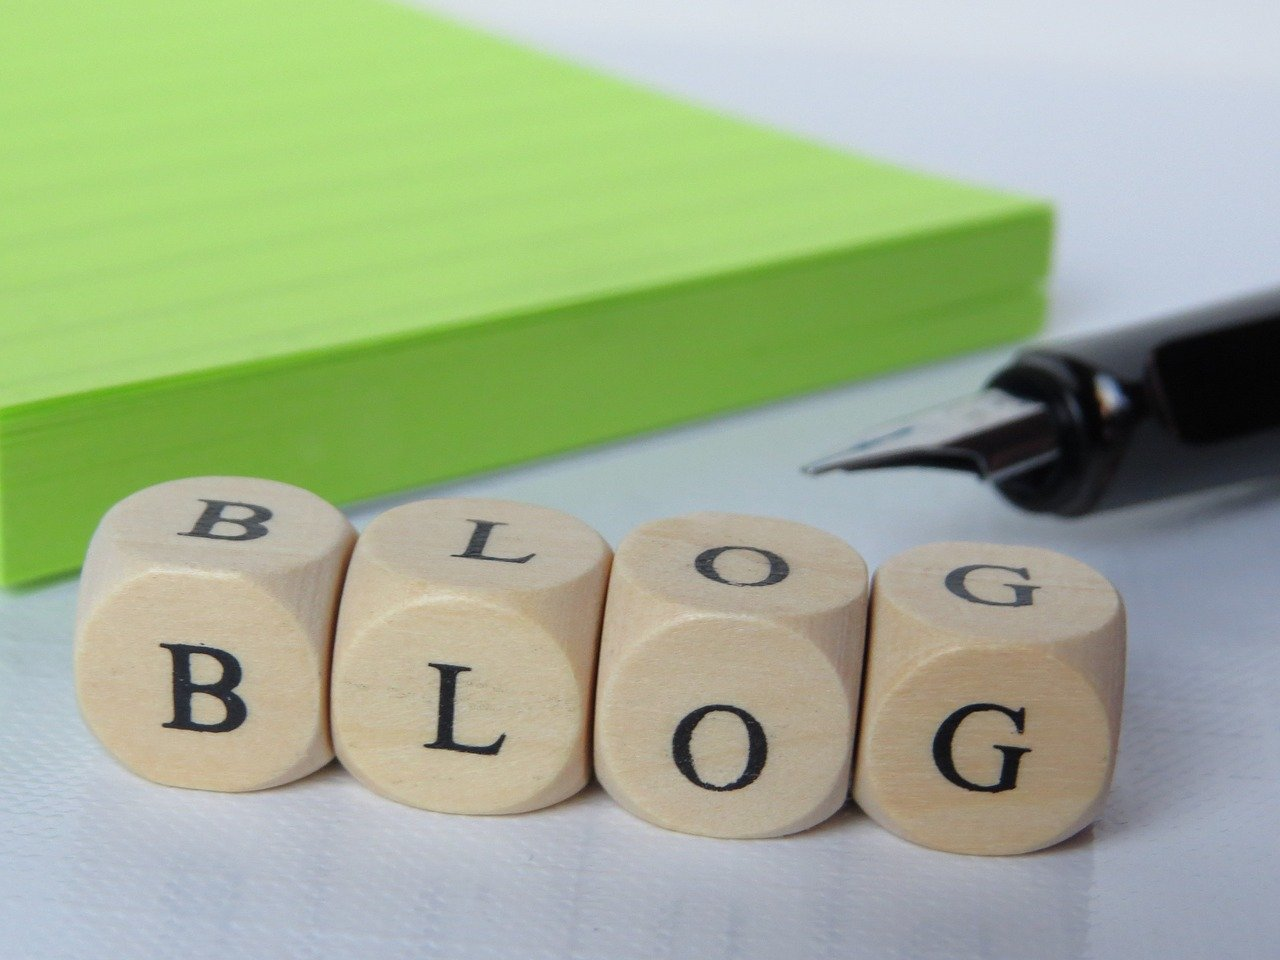 Création d'un site Internet Montigny-lès-Metz avec WordPress